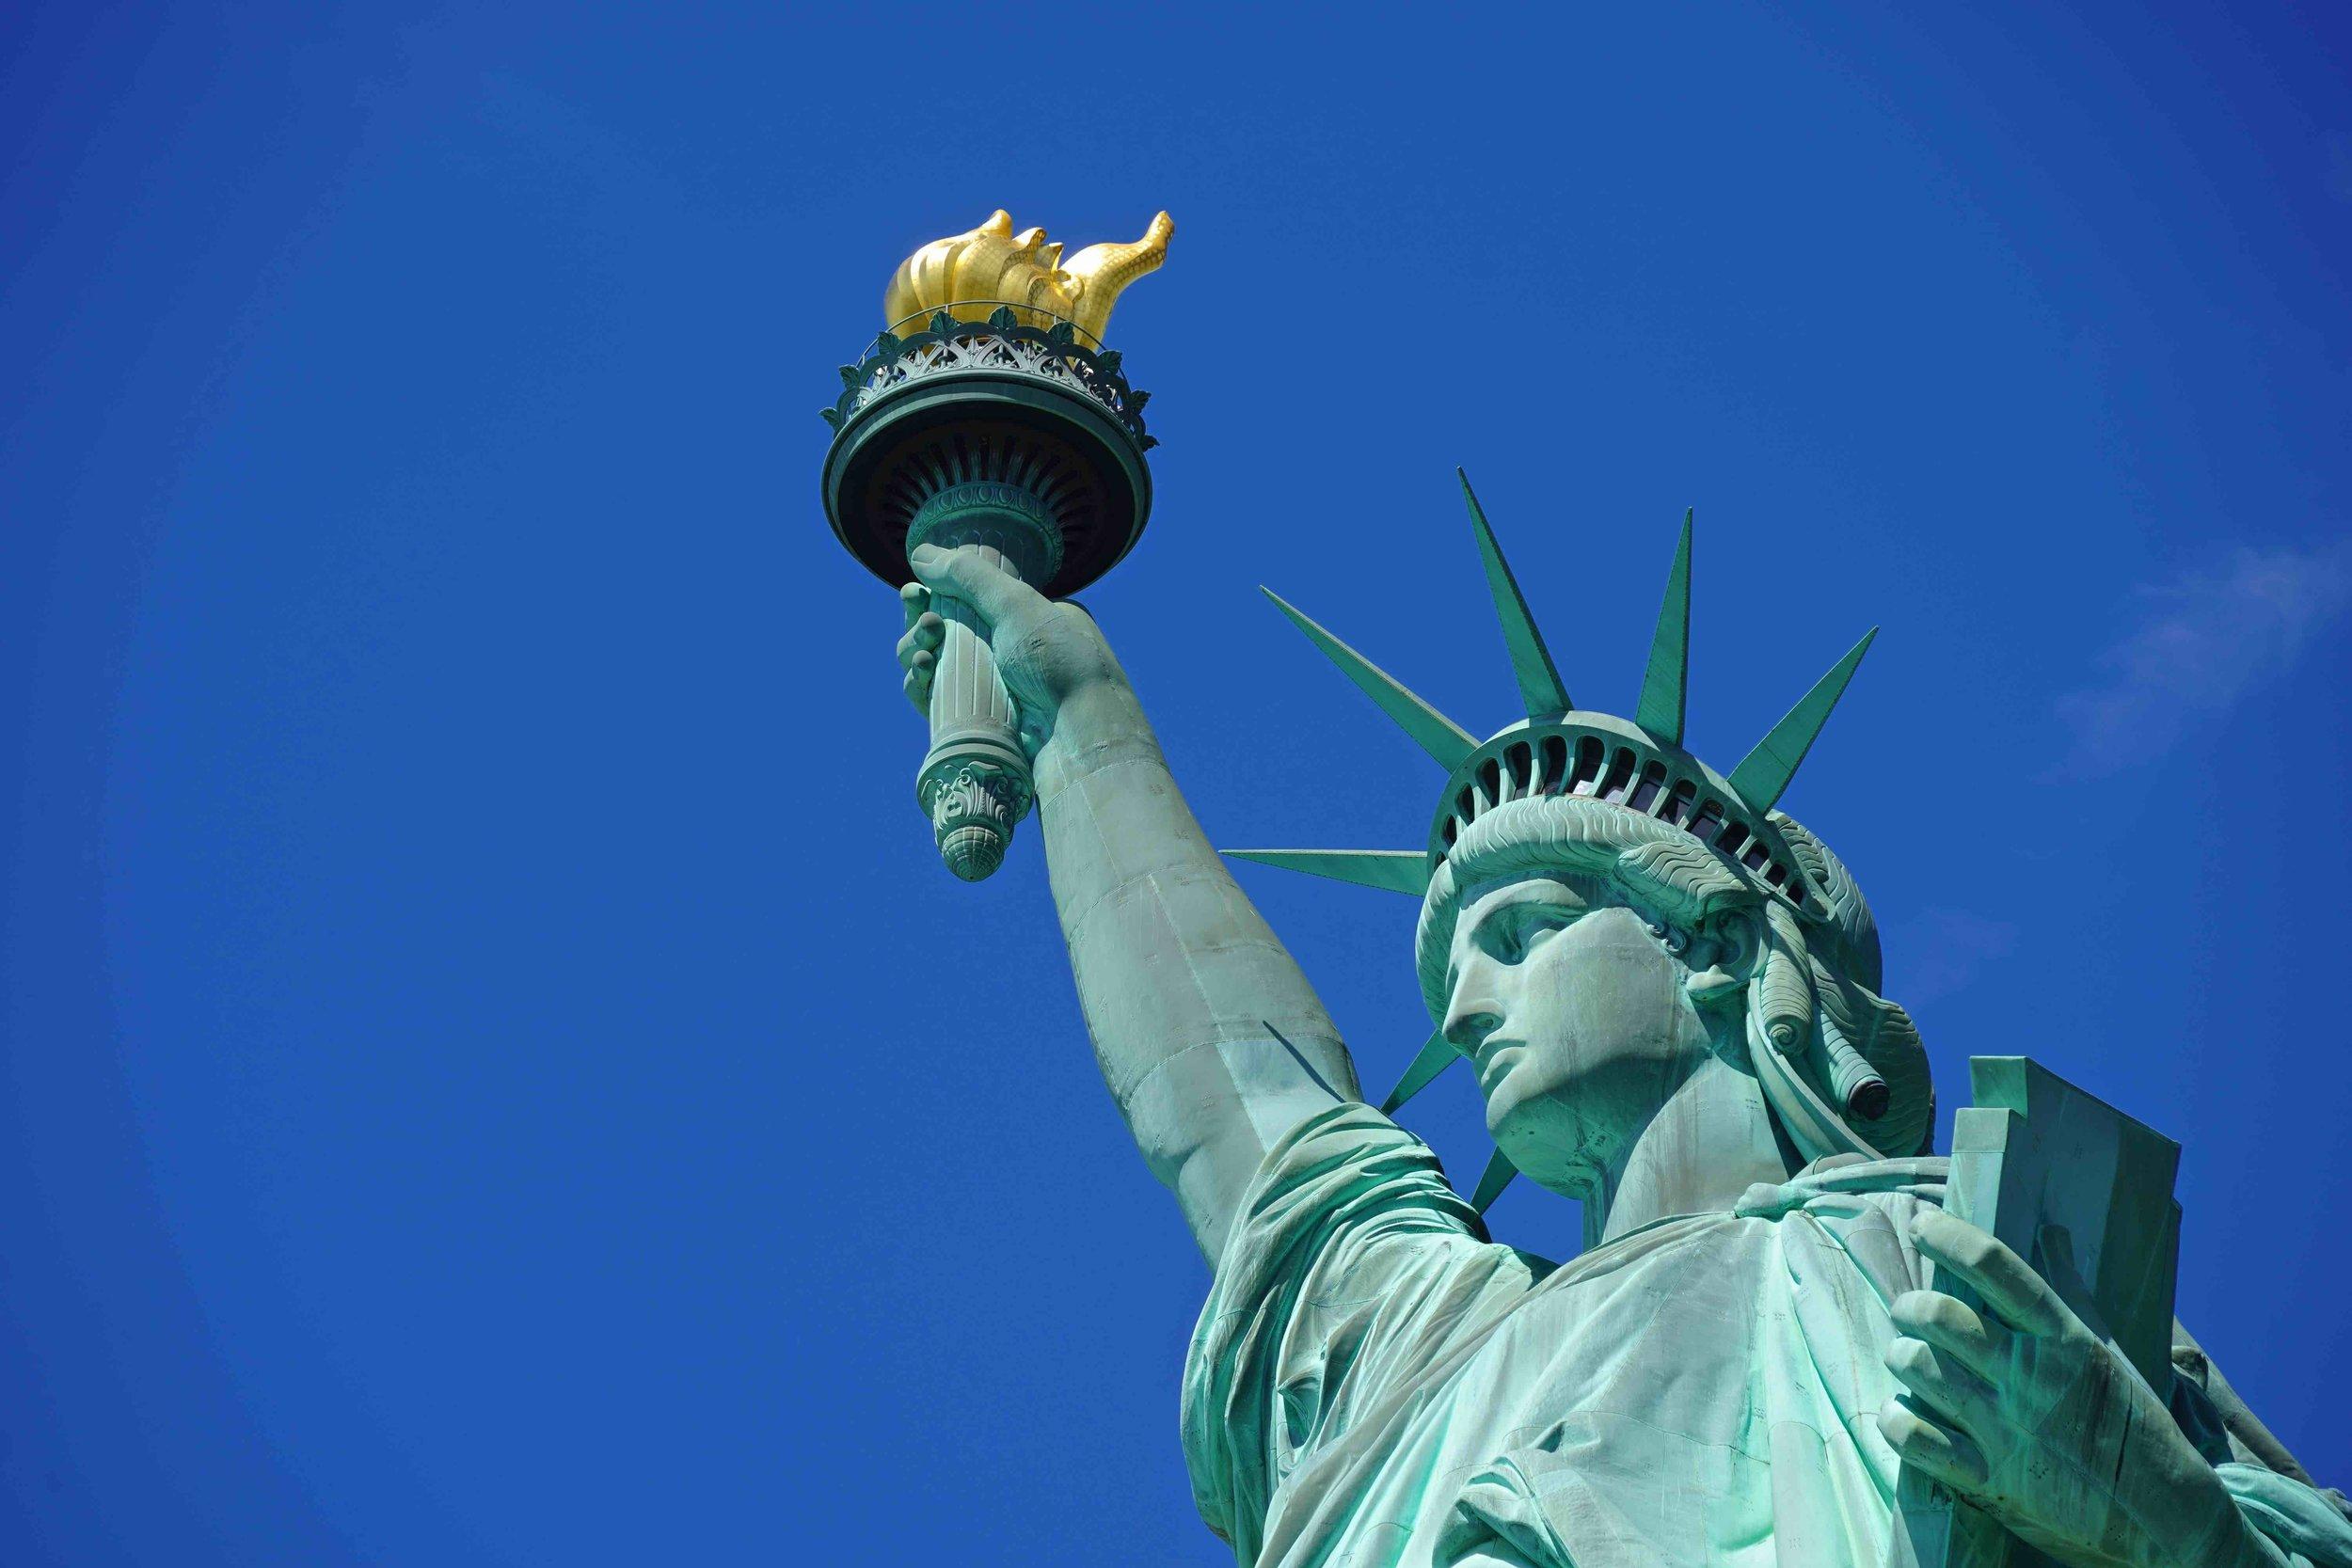 Statue of Liberty NYC CU.jpg